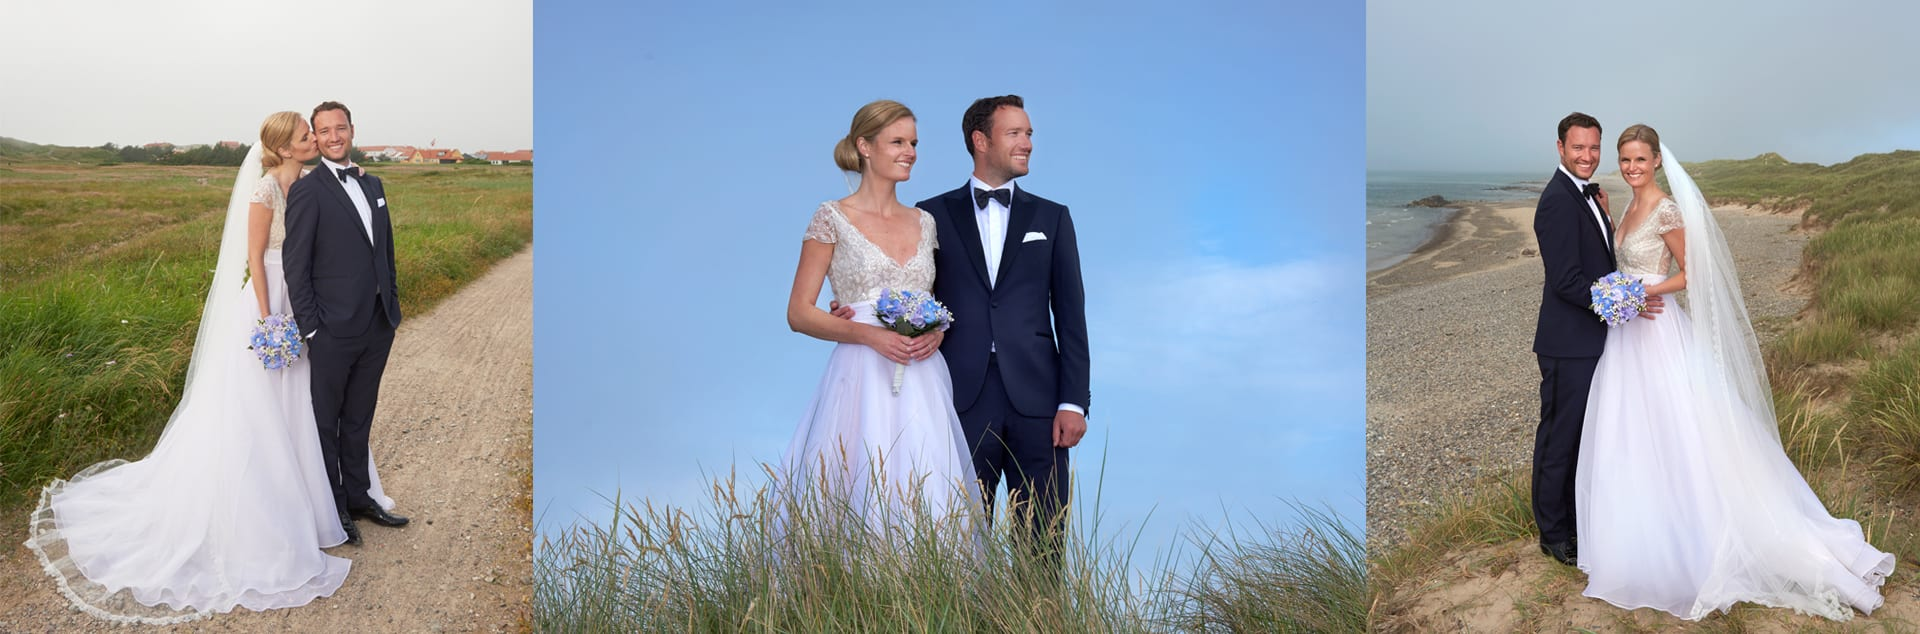 BryllupfotoSkagen